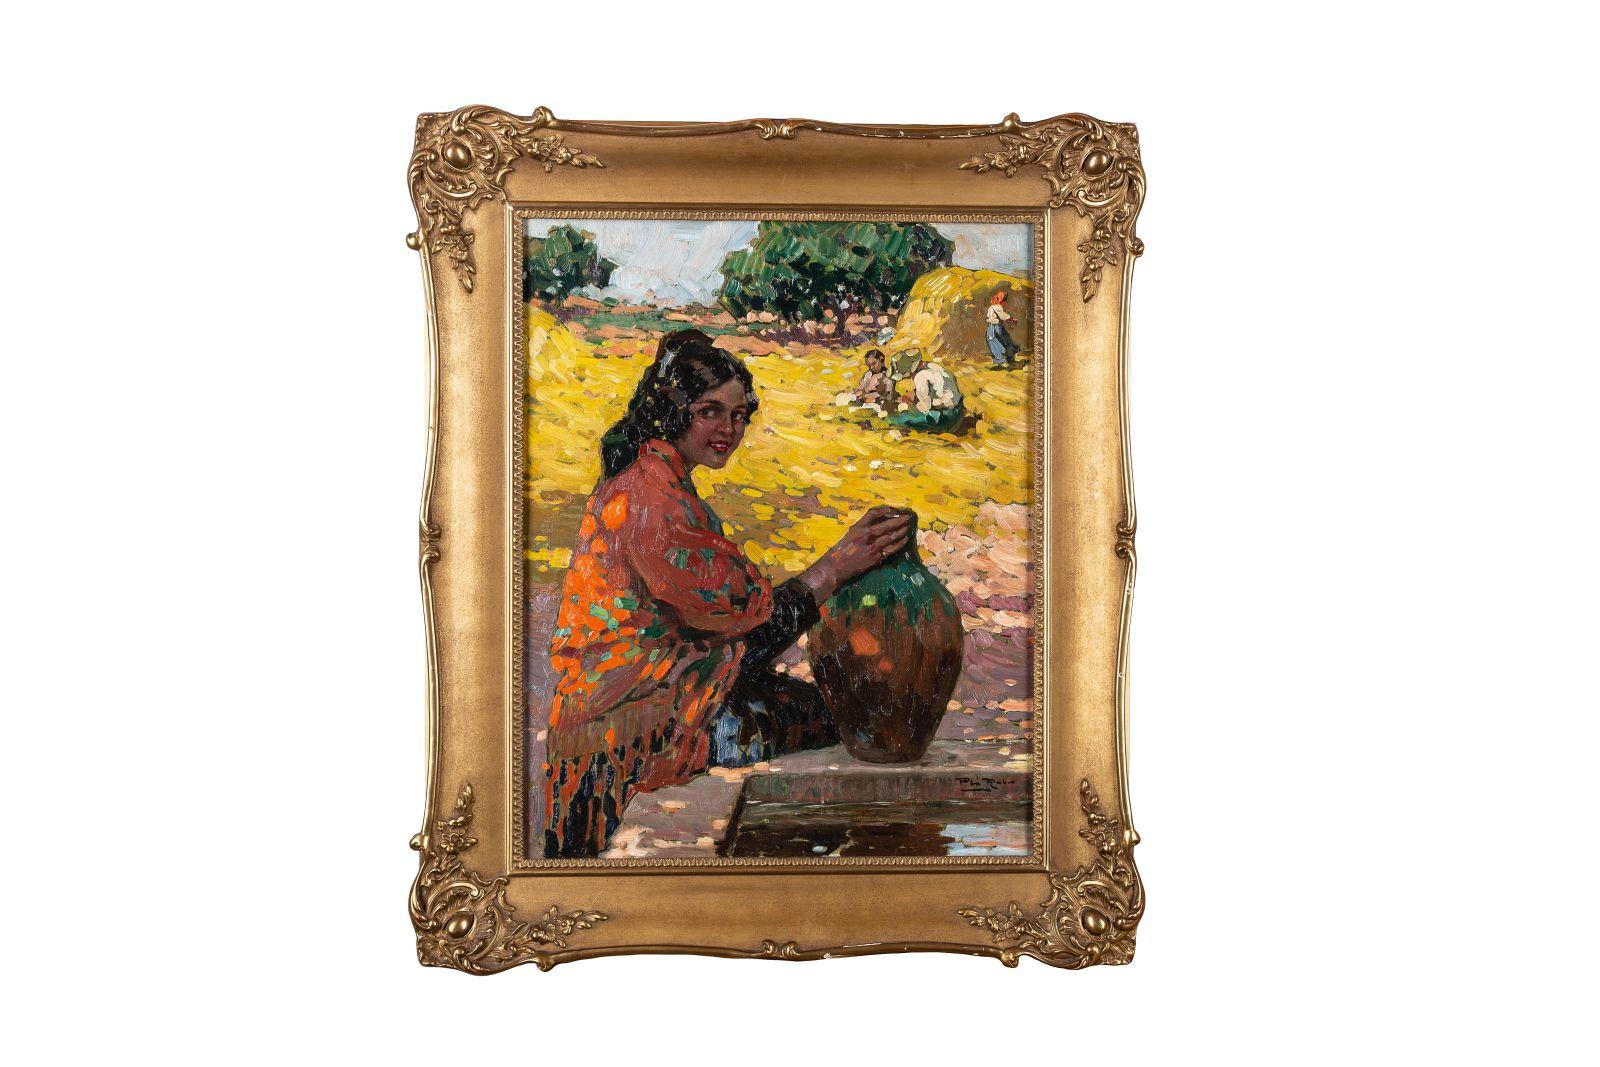 "#60 Alberto Plá y Rubio, ""Girl at the Fountain"", c. 1910   Alberto Plá y Rubio, ""Mädchen beim Brunnen"", um 1910  Image"